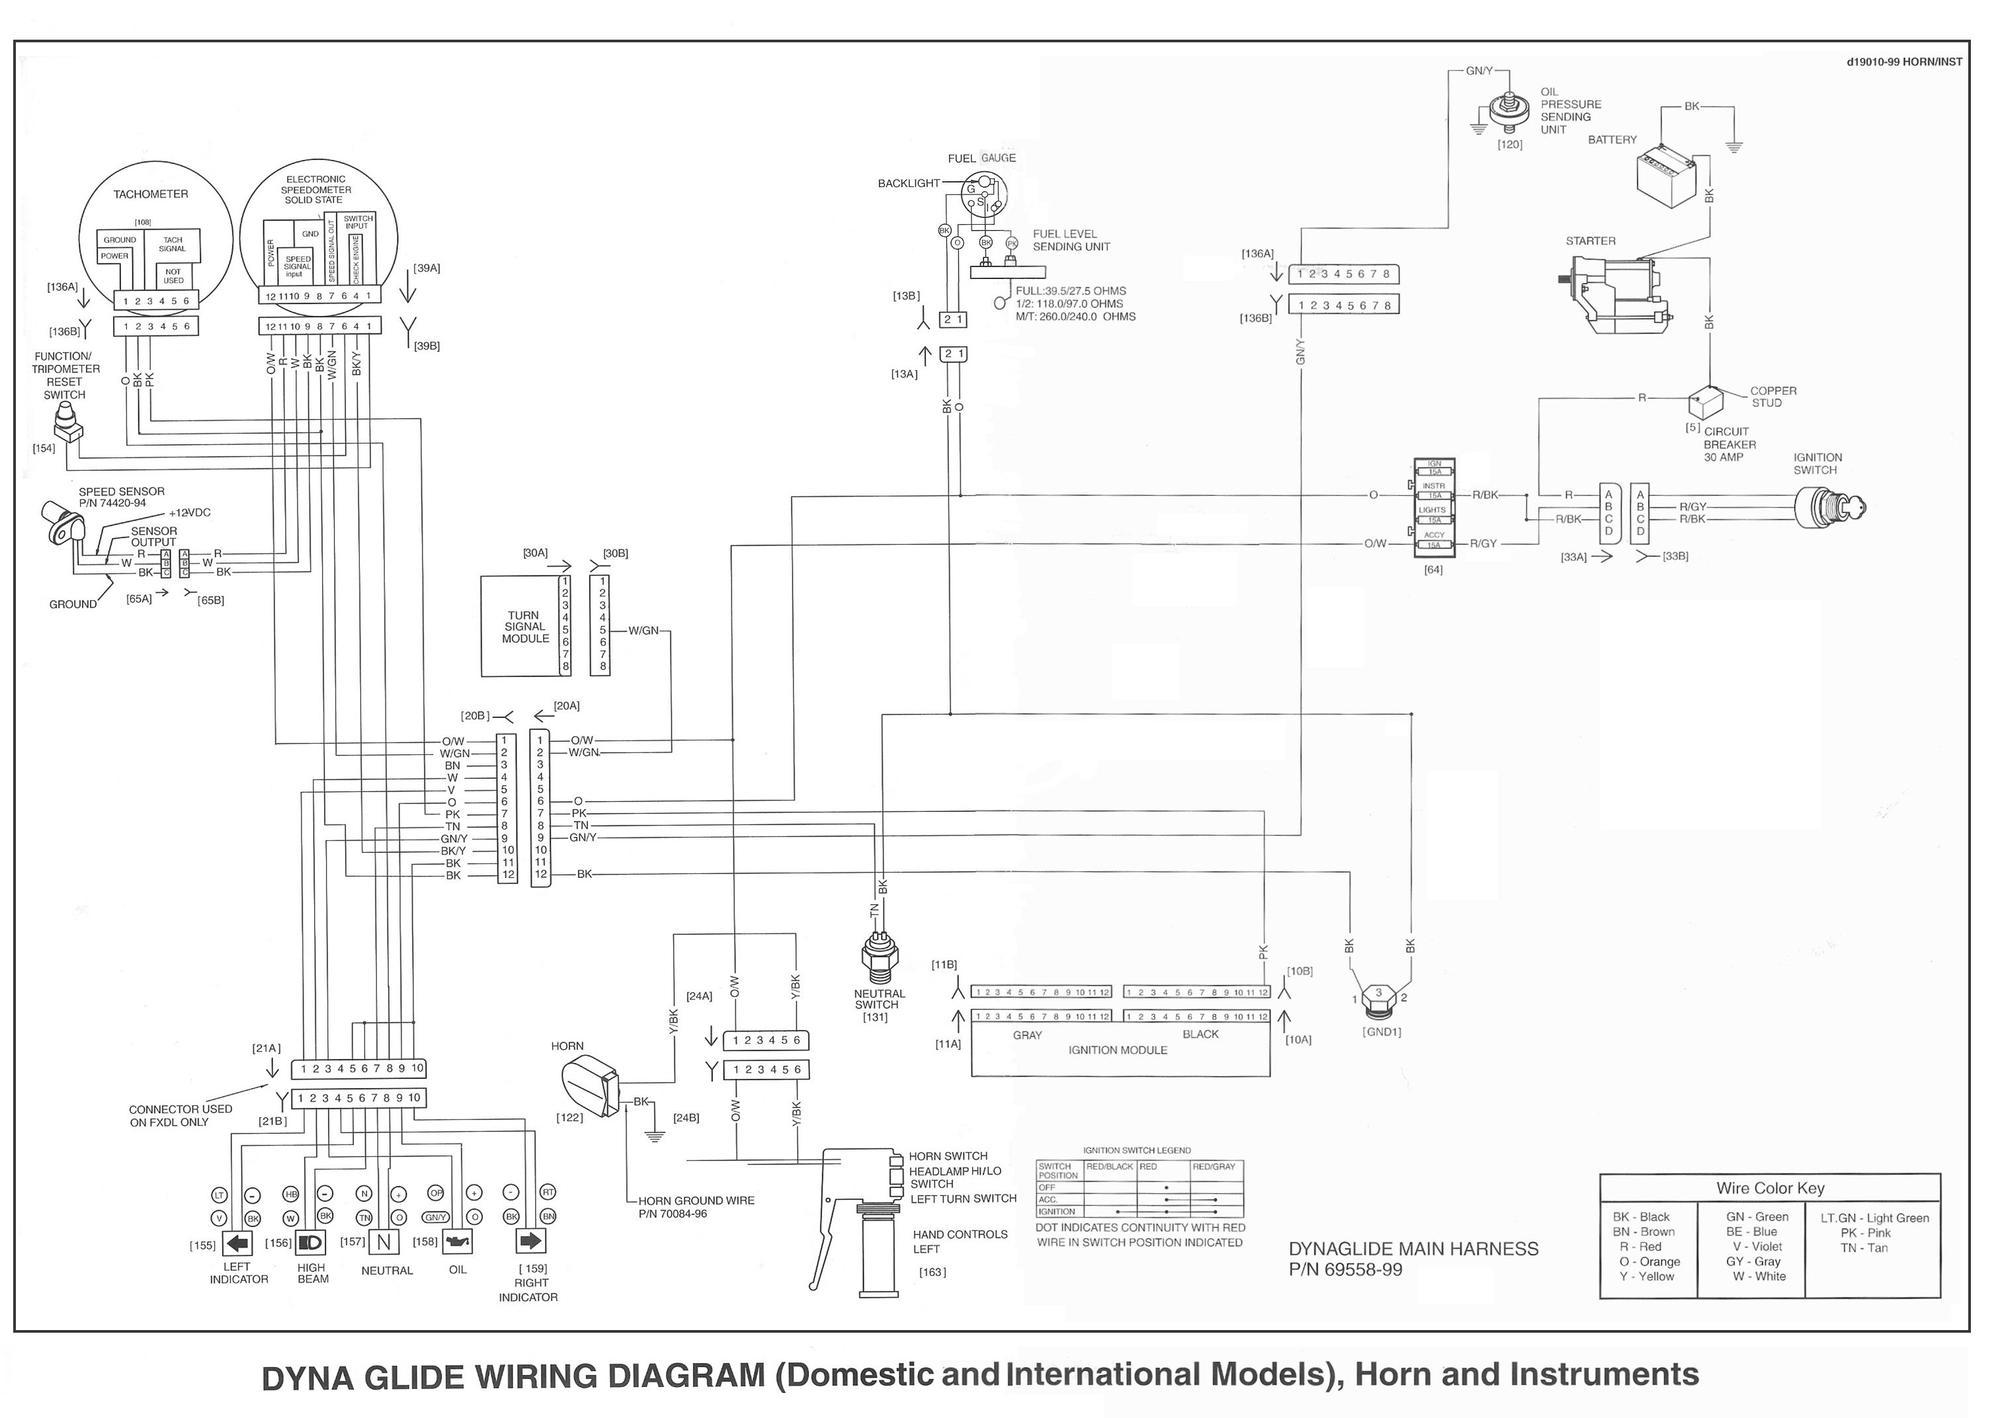 Harley Davidson Dyna Super Glide Wiring Diagram : Harley dyna super glide wiring diagram